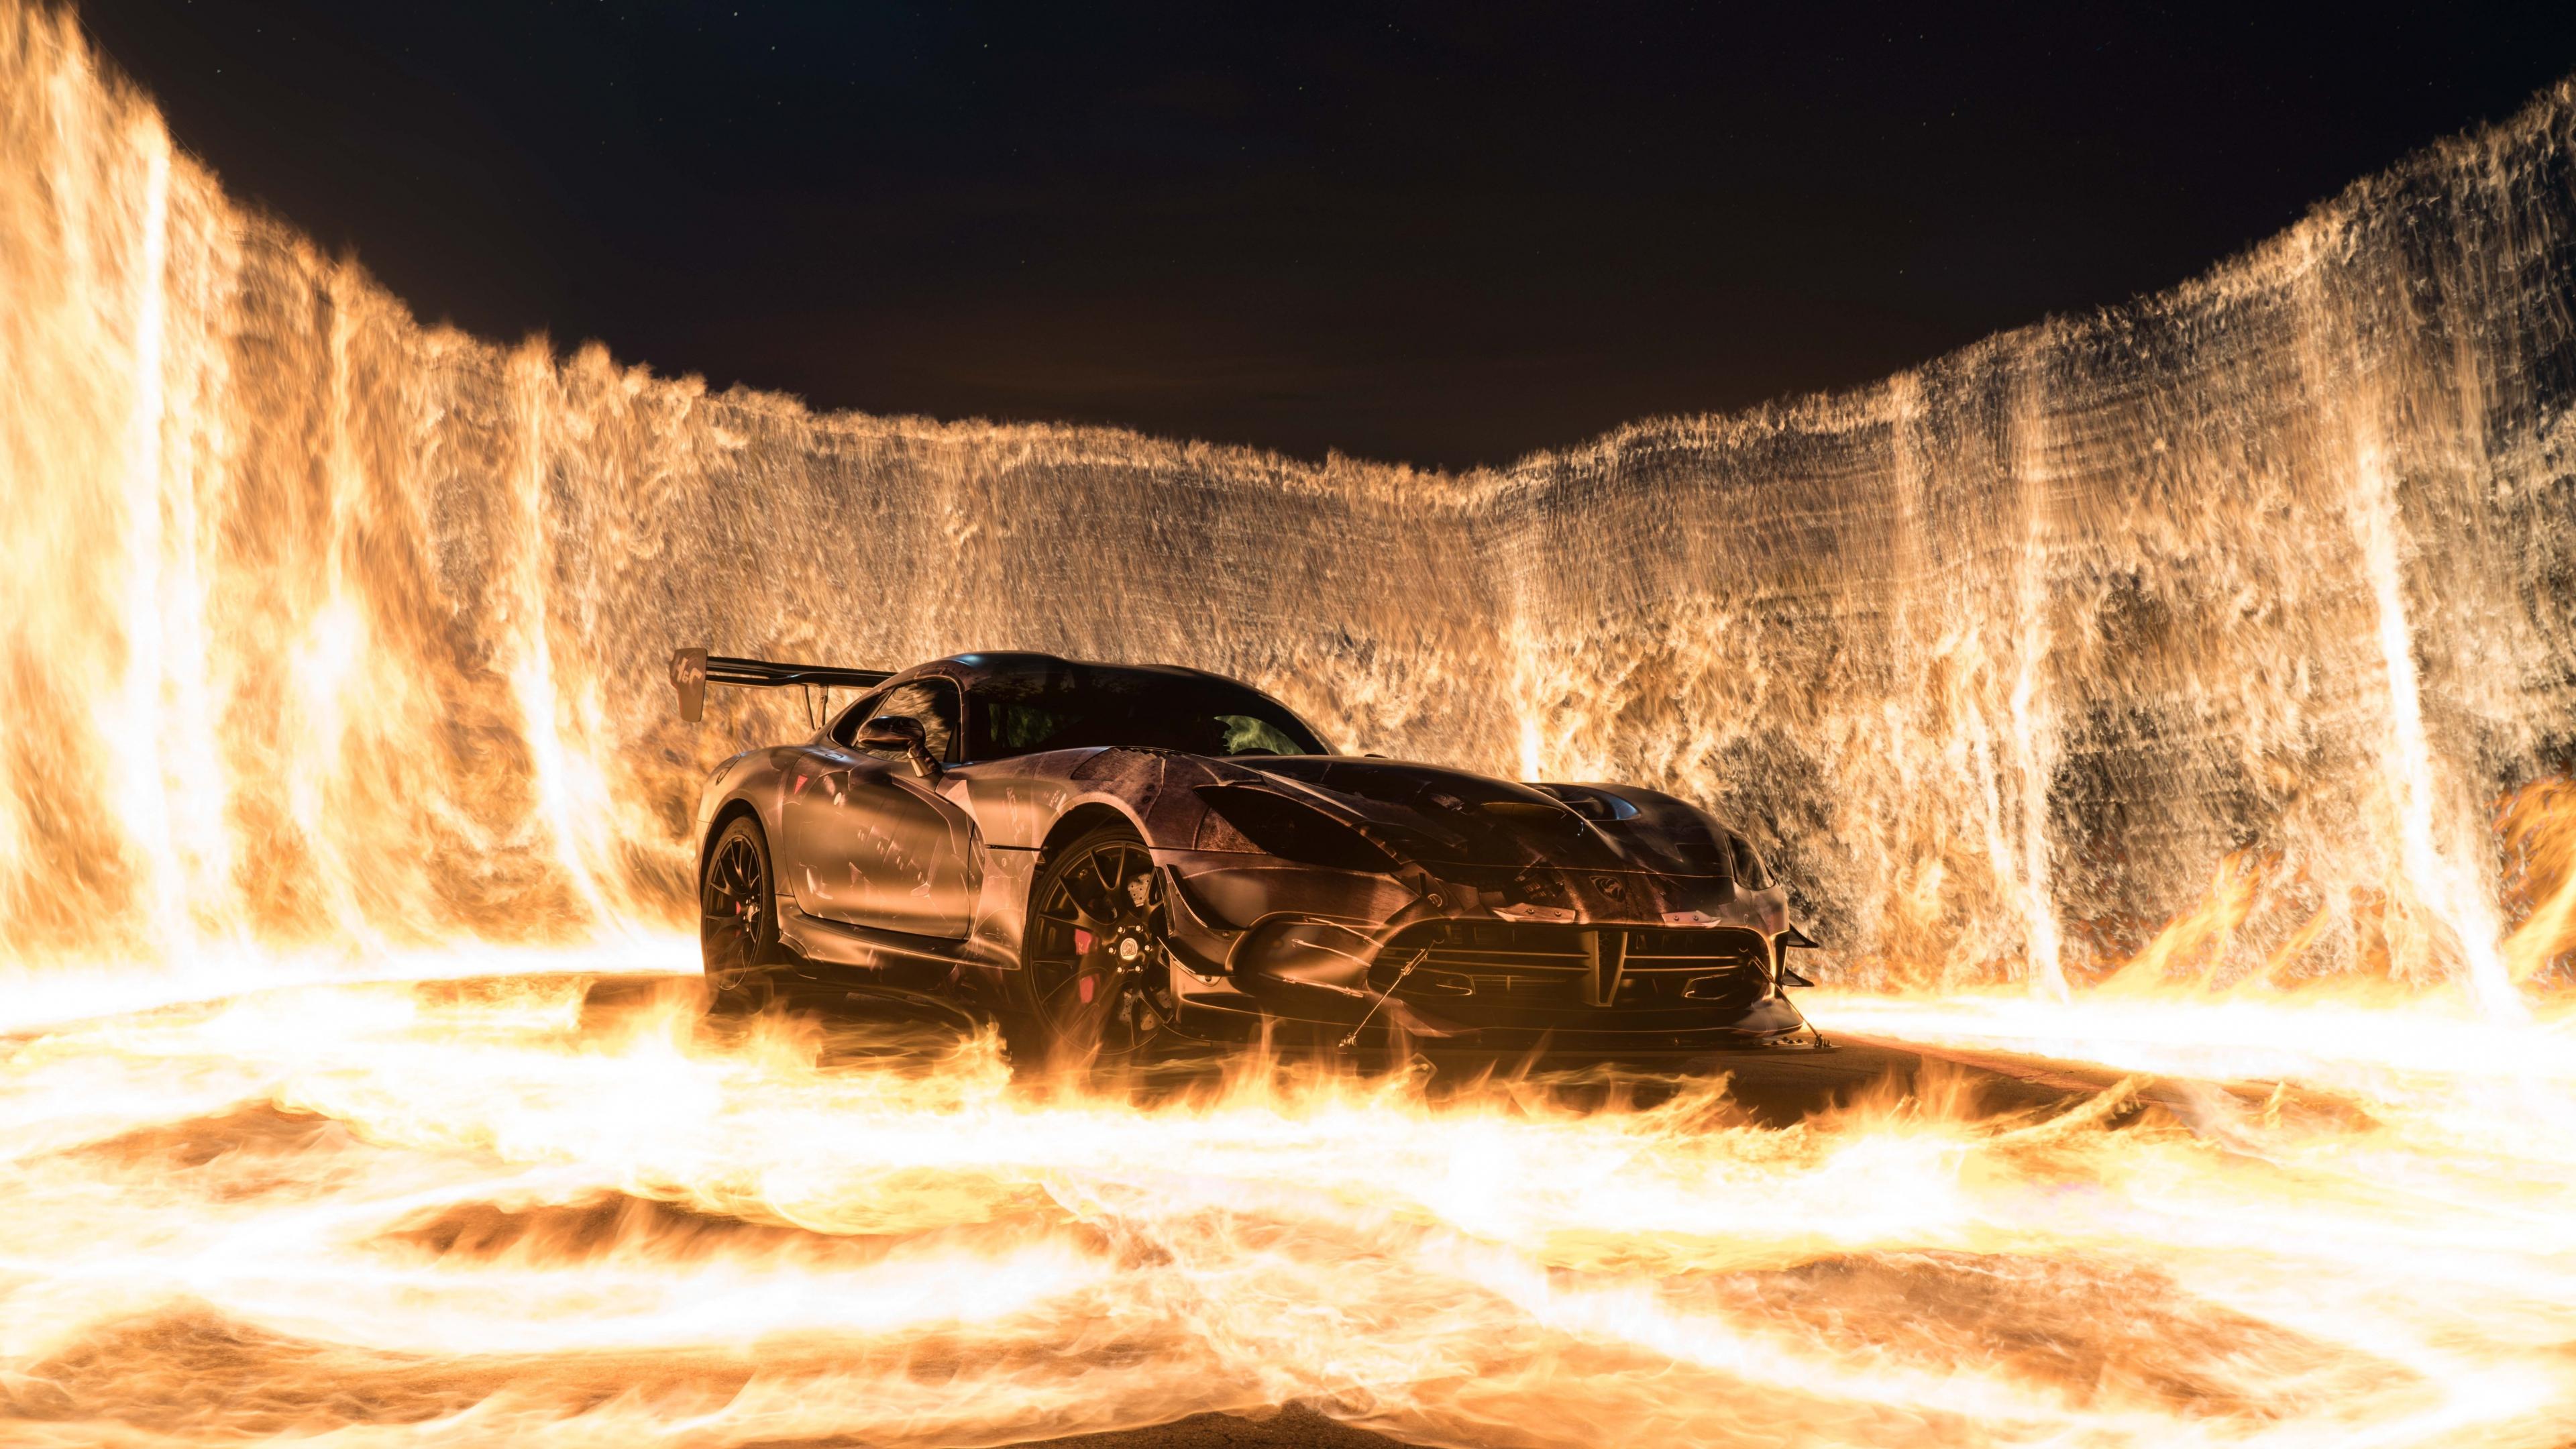 Download 3840x2160 wallpaper sports car, car on fire, 4k ...